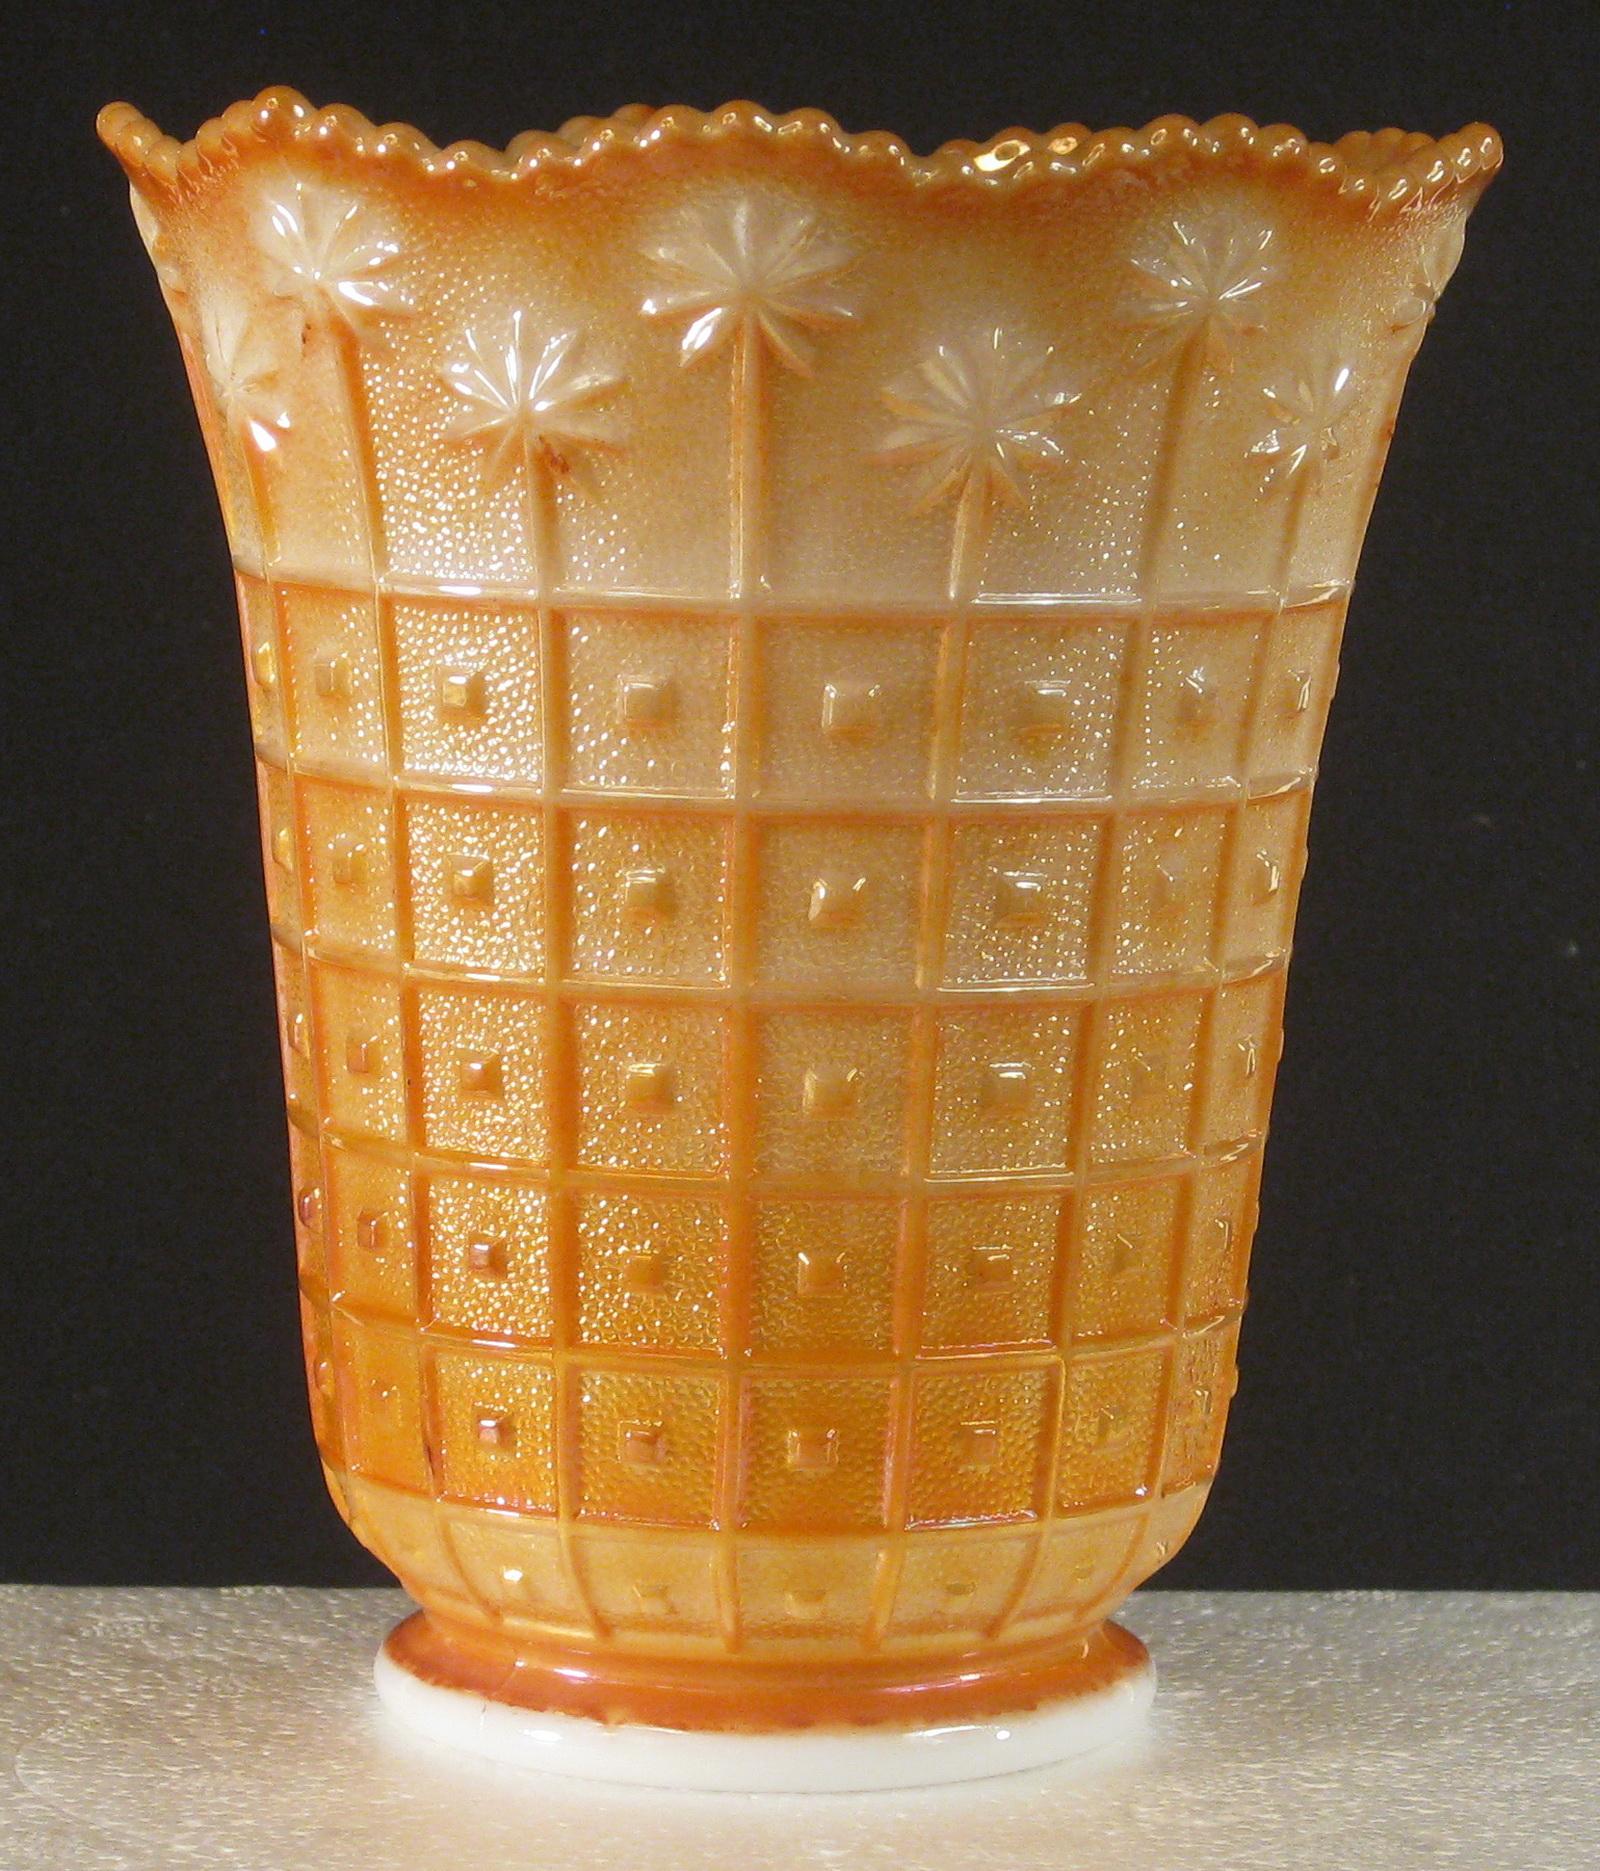 Imperial marigold on milk glass block daisy carnival glass vase imperial marigold on milk glass block daisy carnival glass vase carnival glass reviewsmspy